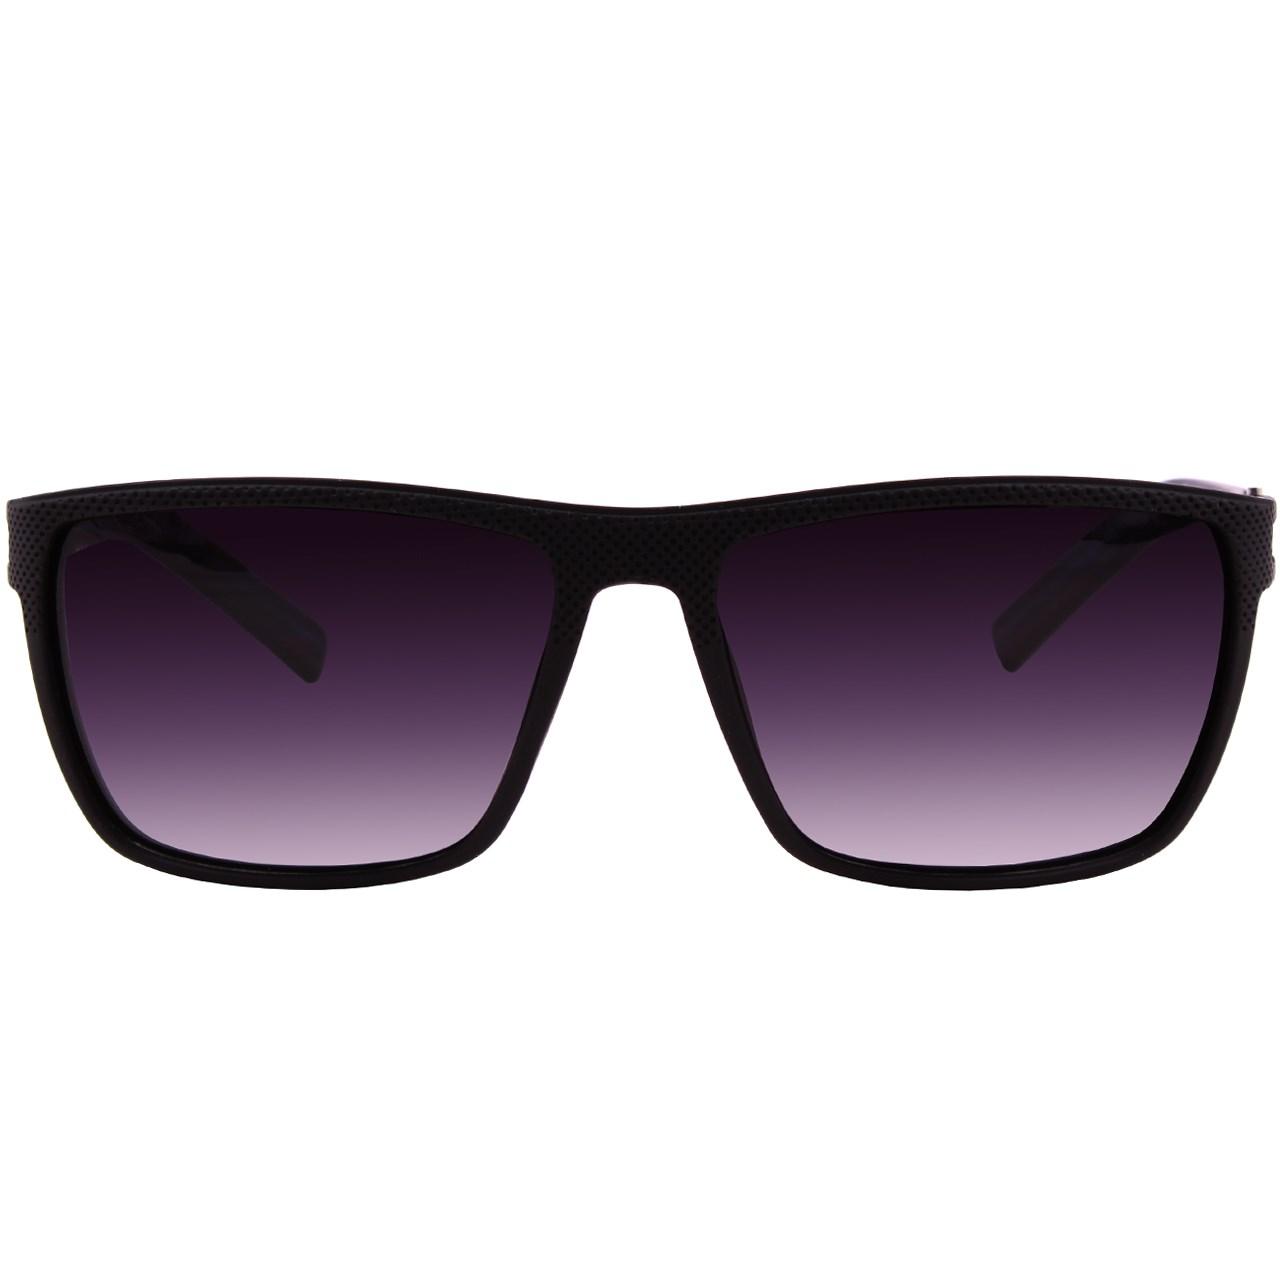 عینک آفتابی  کد 7604